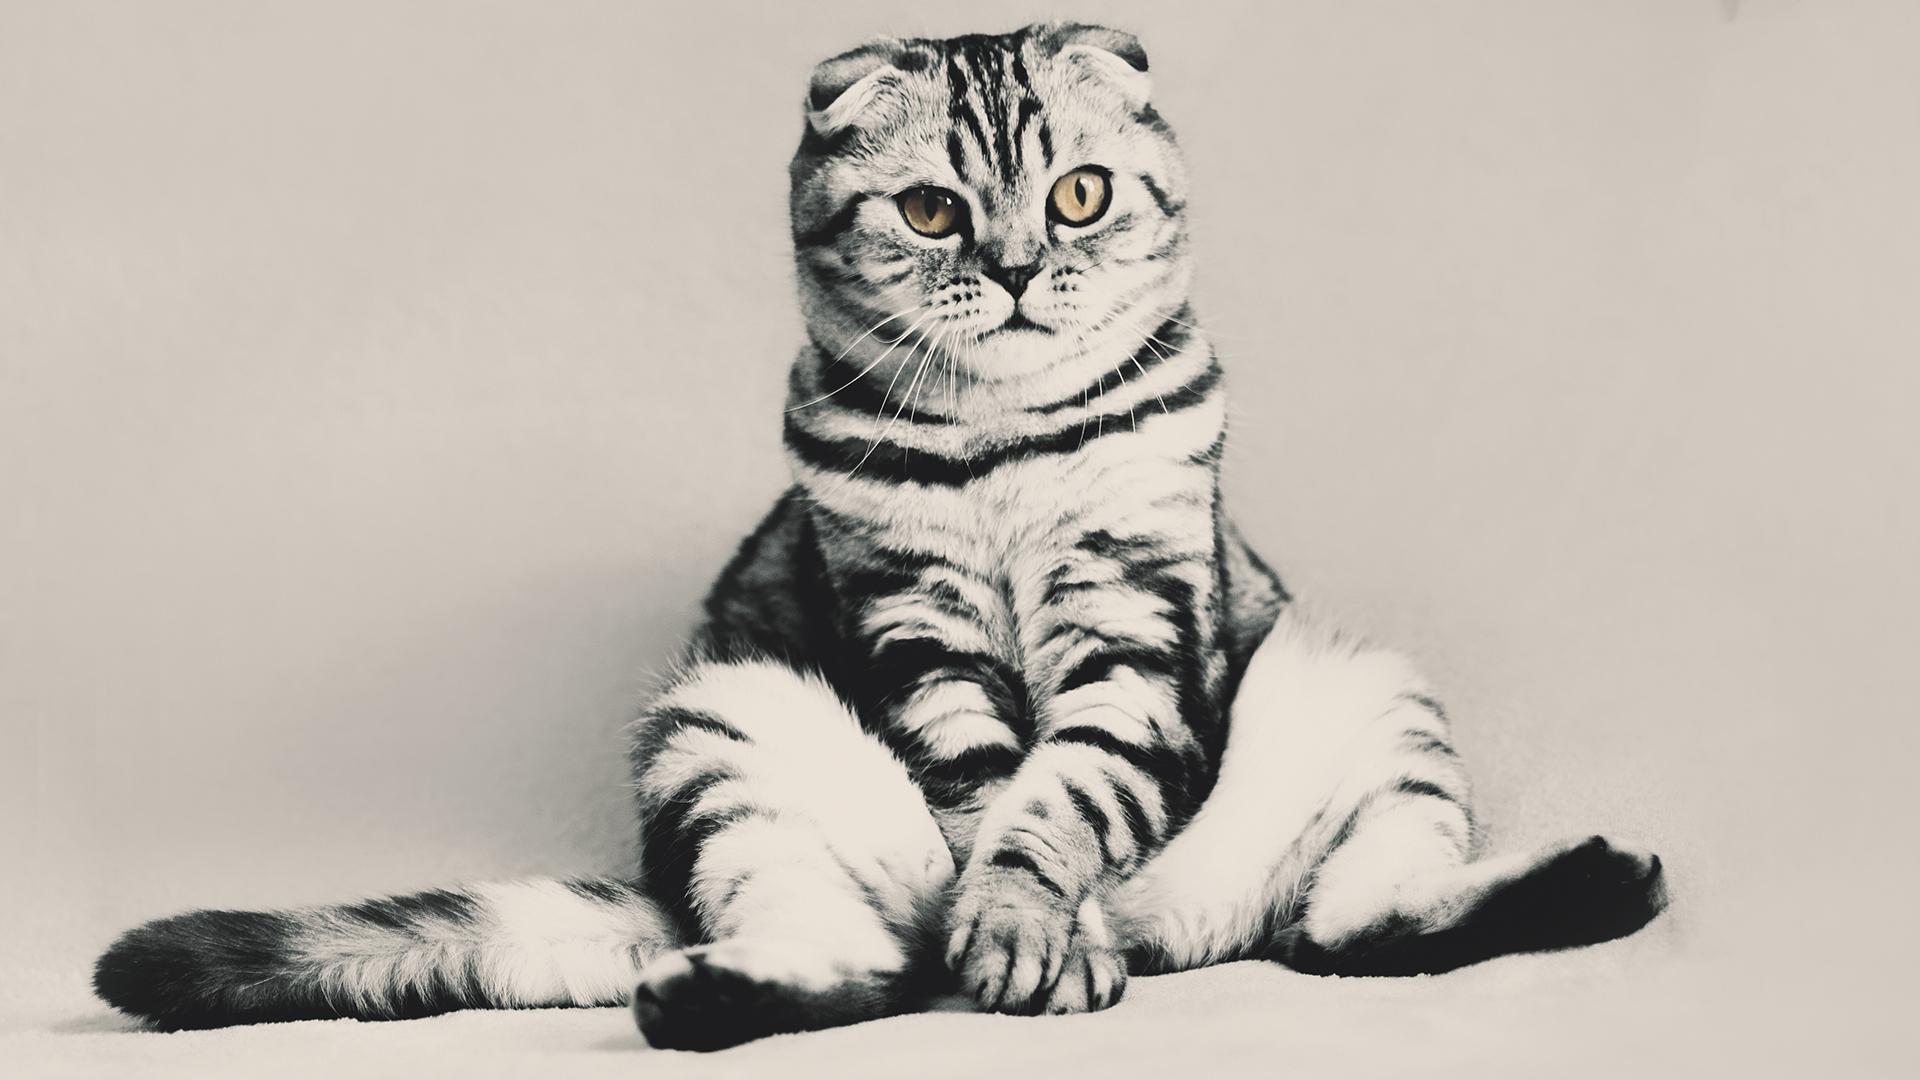 Funny Kitten Laptop Background